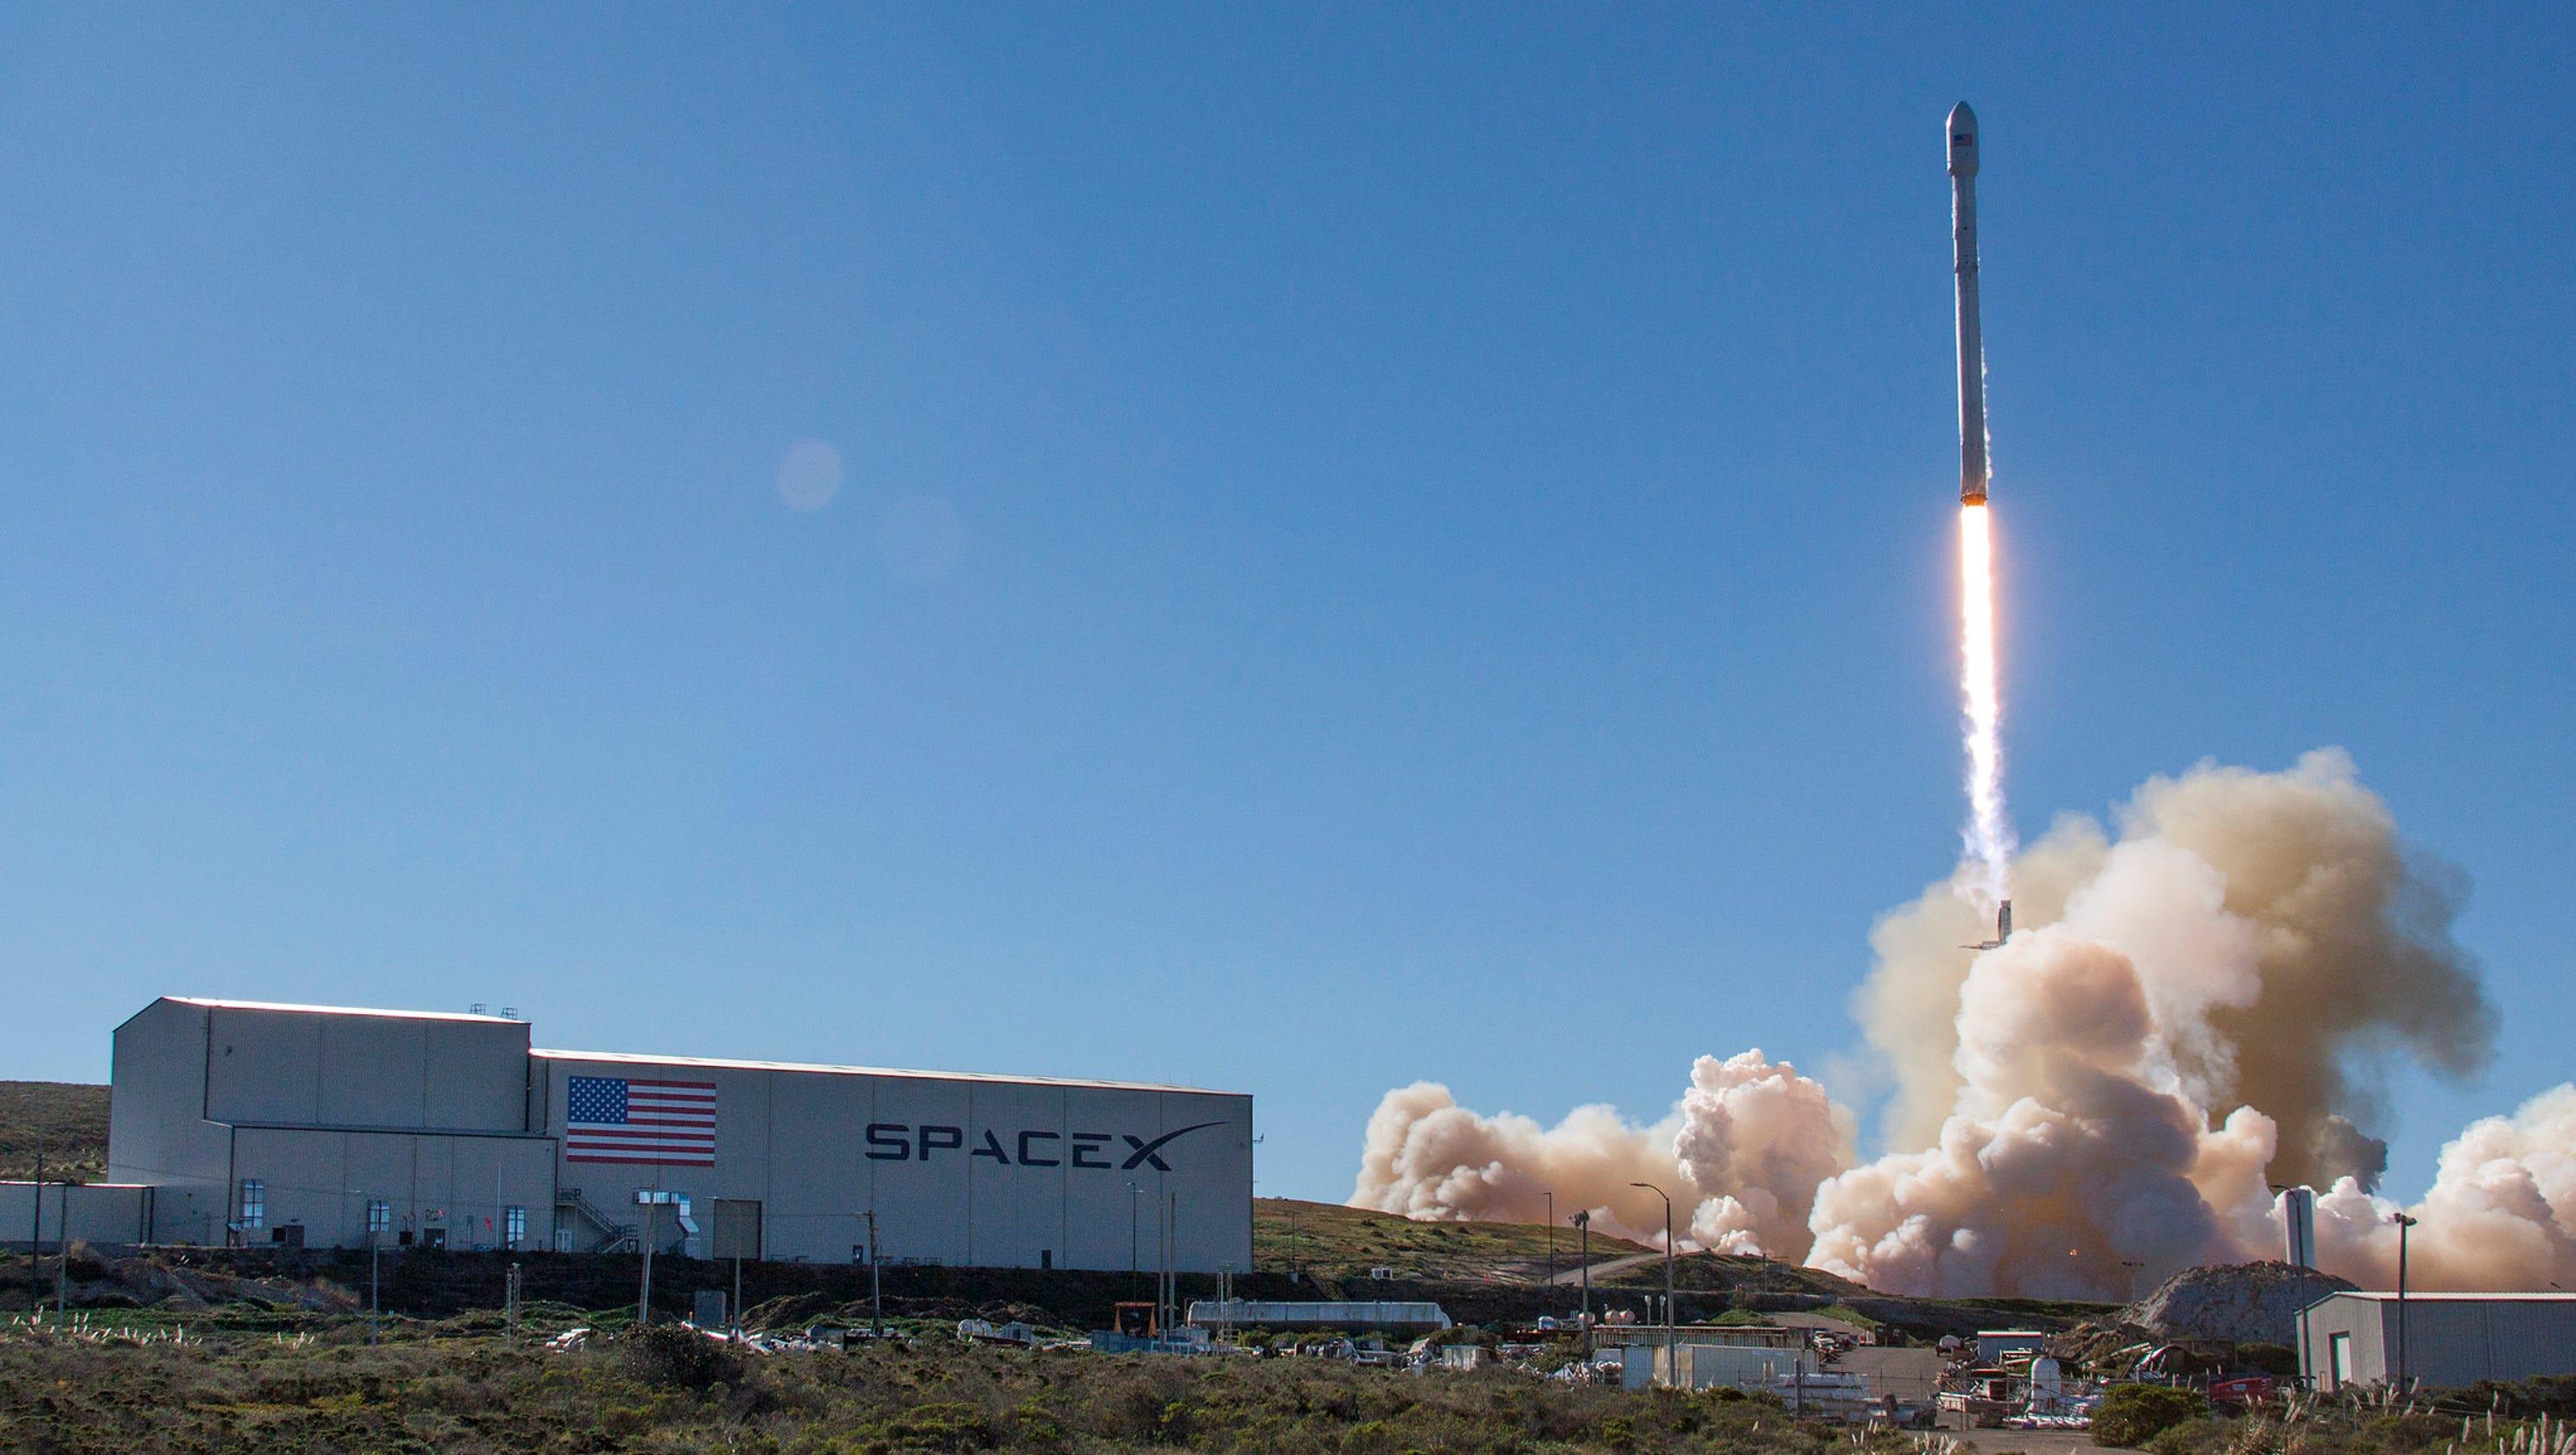 spacex rocket in flight - photo #18